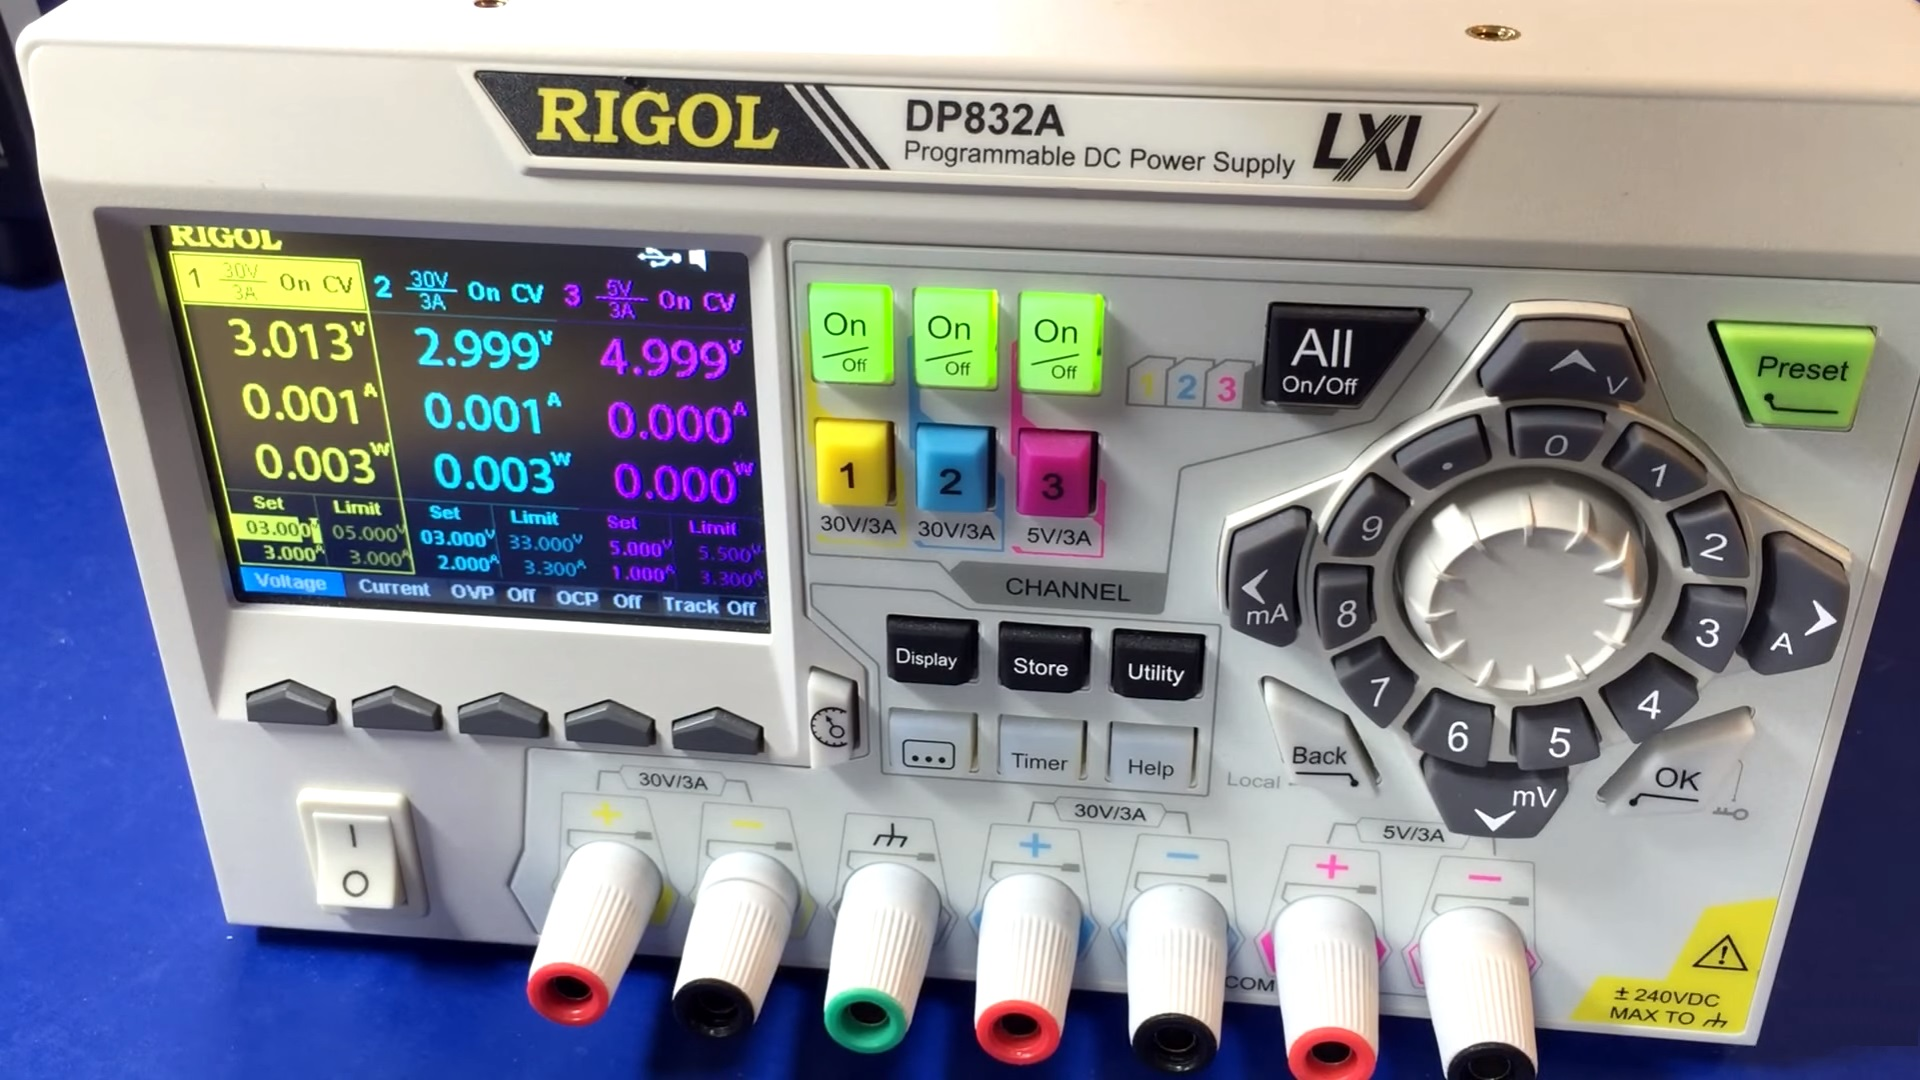 Rigol DP832A-1a-Hardware-Pro